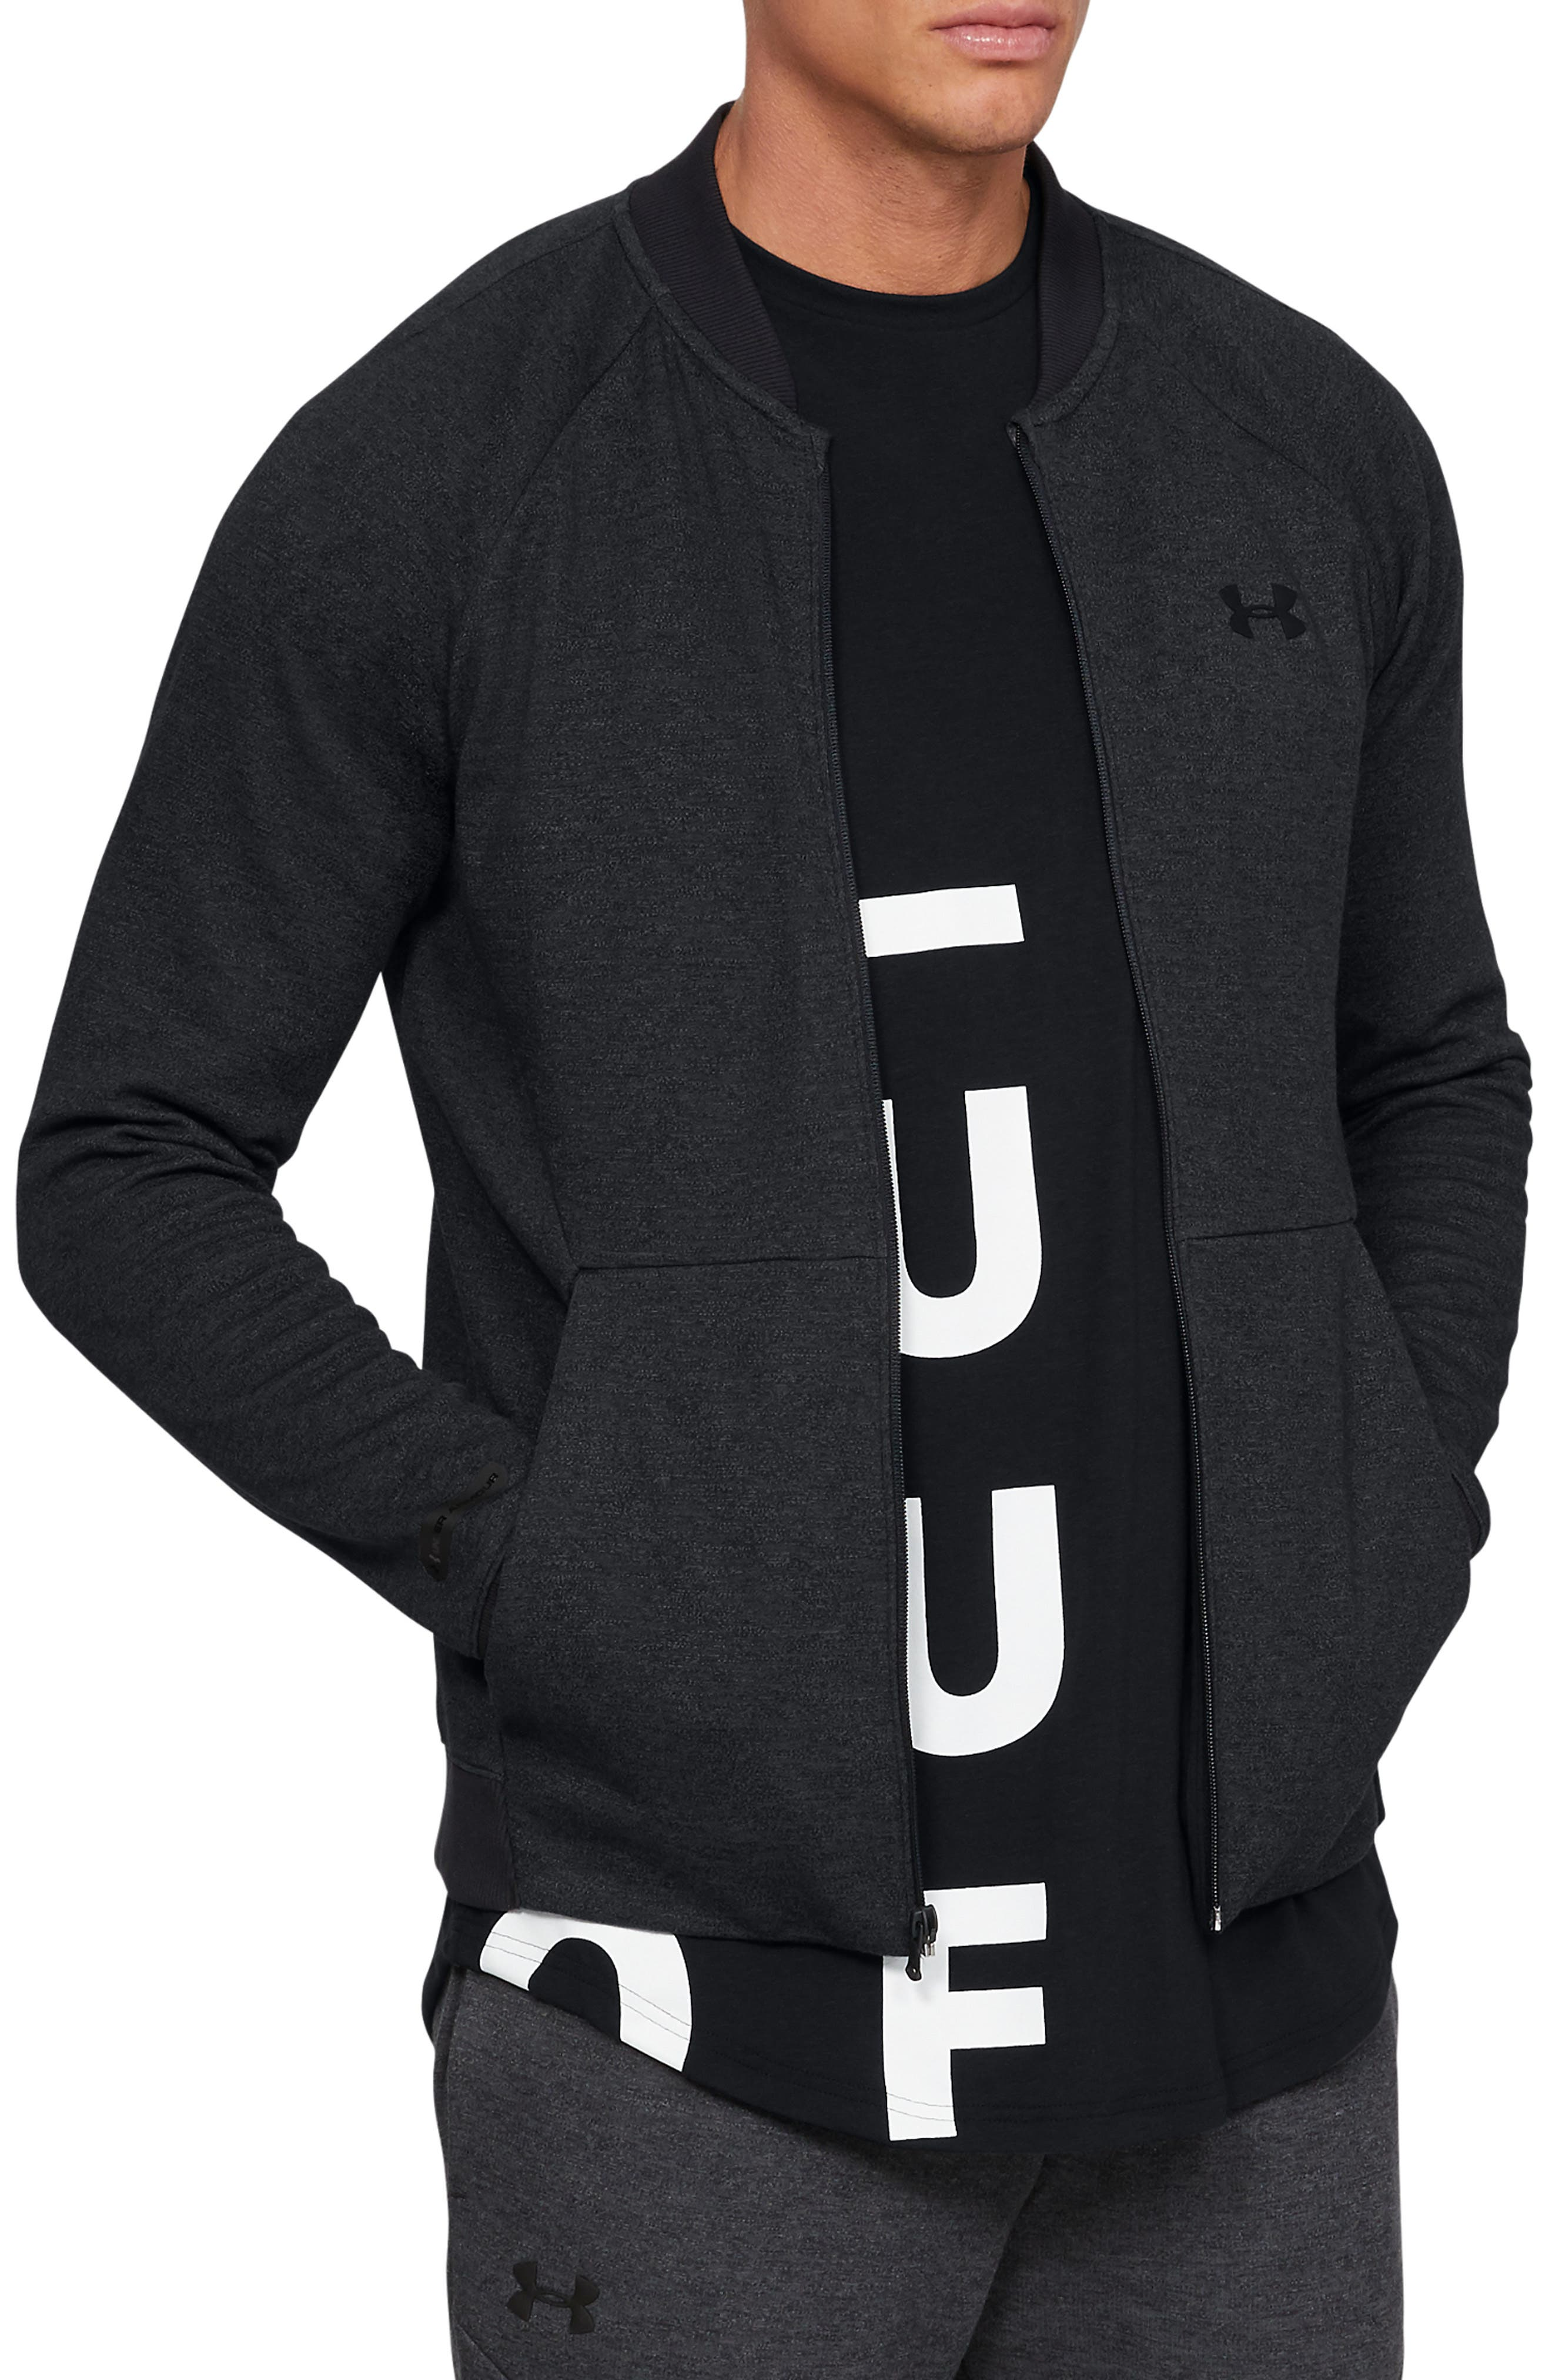 UNDER ARMOUR Unstoppable Double Knit Bomber Jacket, Main, color, BLACK/ BLACK/ BLACK